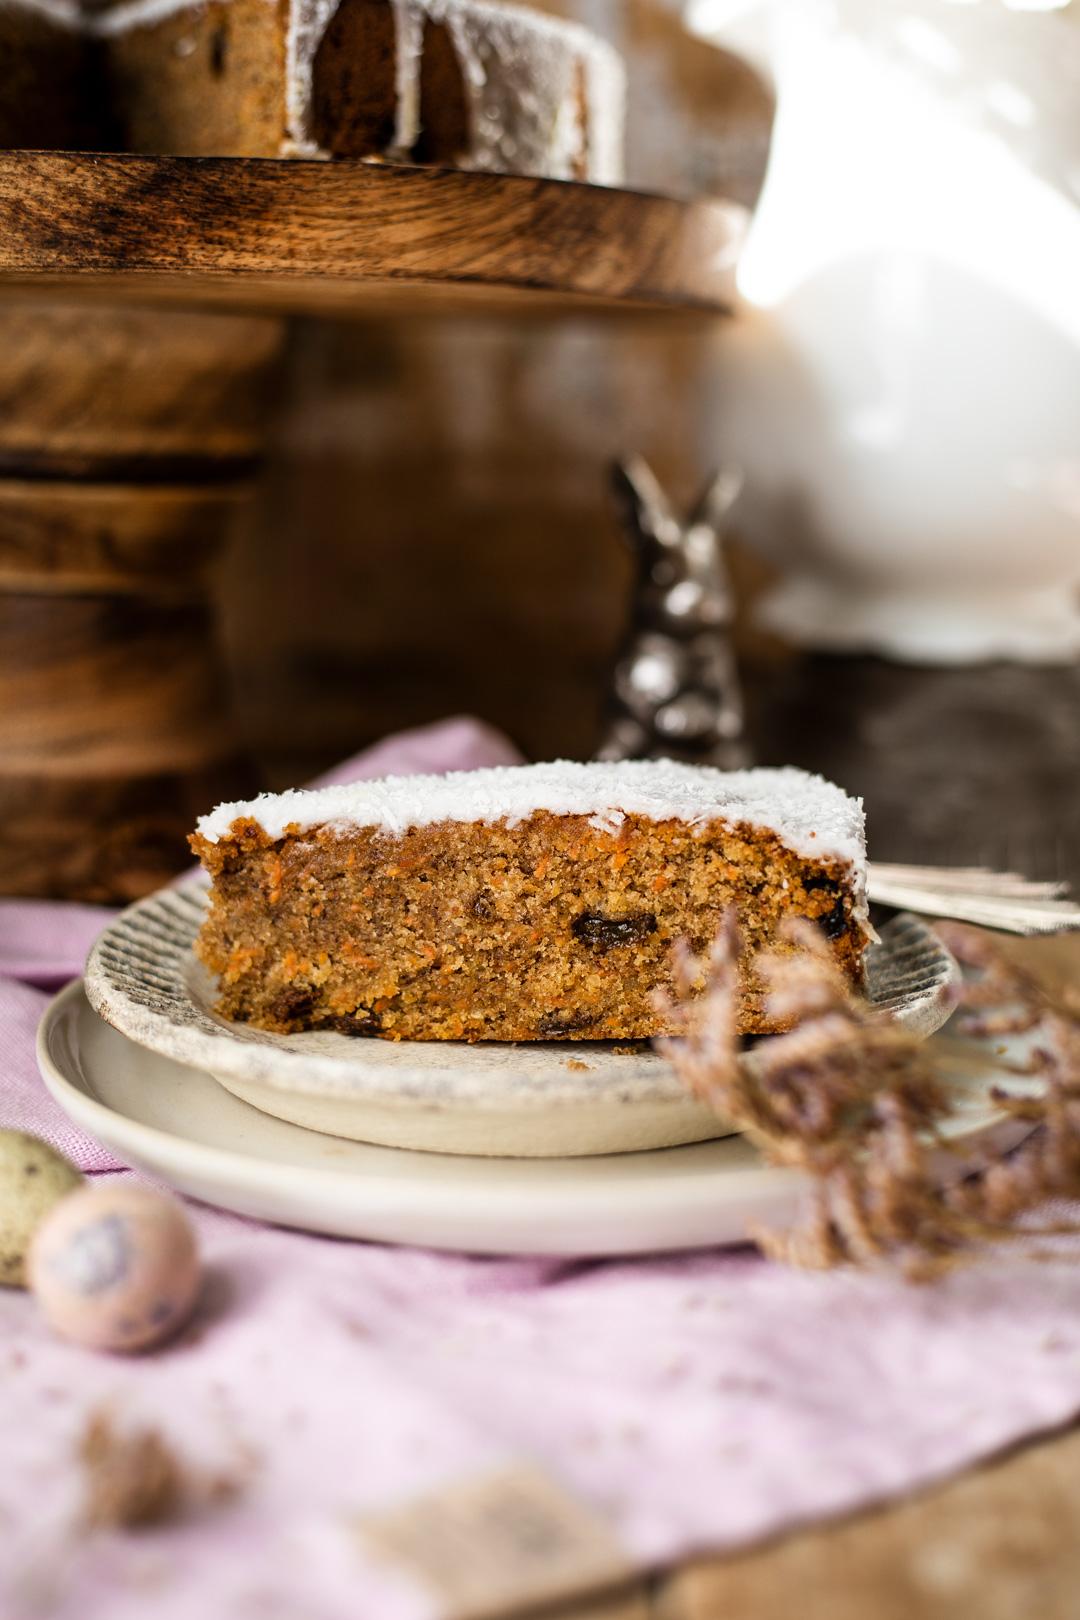 Karotten Kuchen mit Kokosmilchguss - Kochmädchen Foodblog